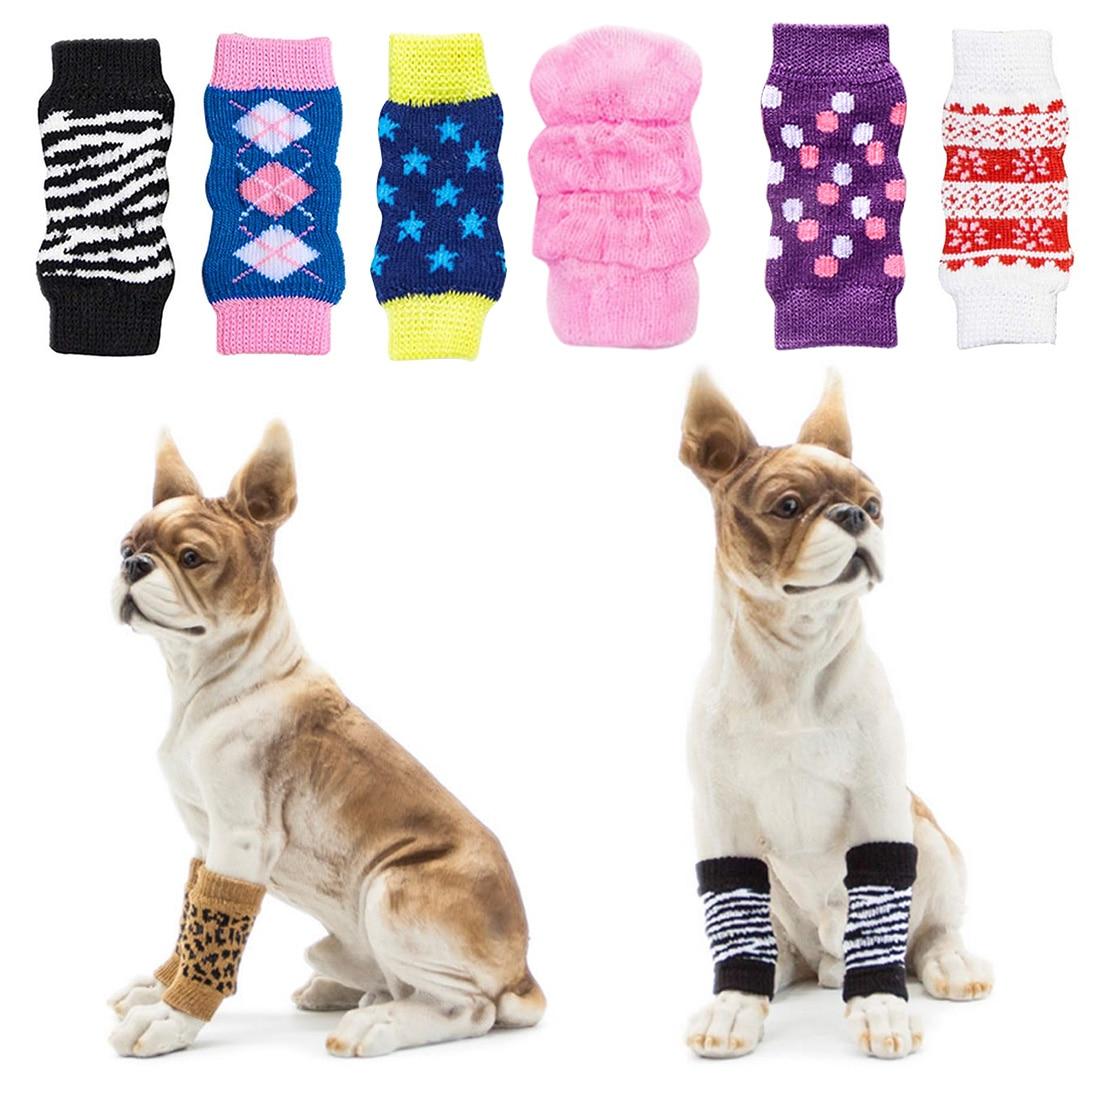 Pet Supplies 4Pcs/Set Winter Thick Warm Puppy Pet Dog Leg Socks Anti Slip Shoes Zebra Leopard Dots Print Non-slip Leg Warmers